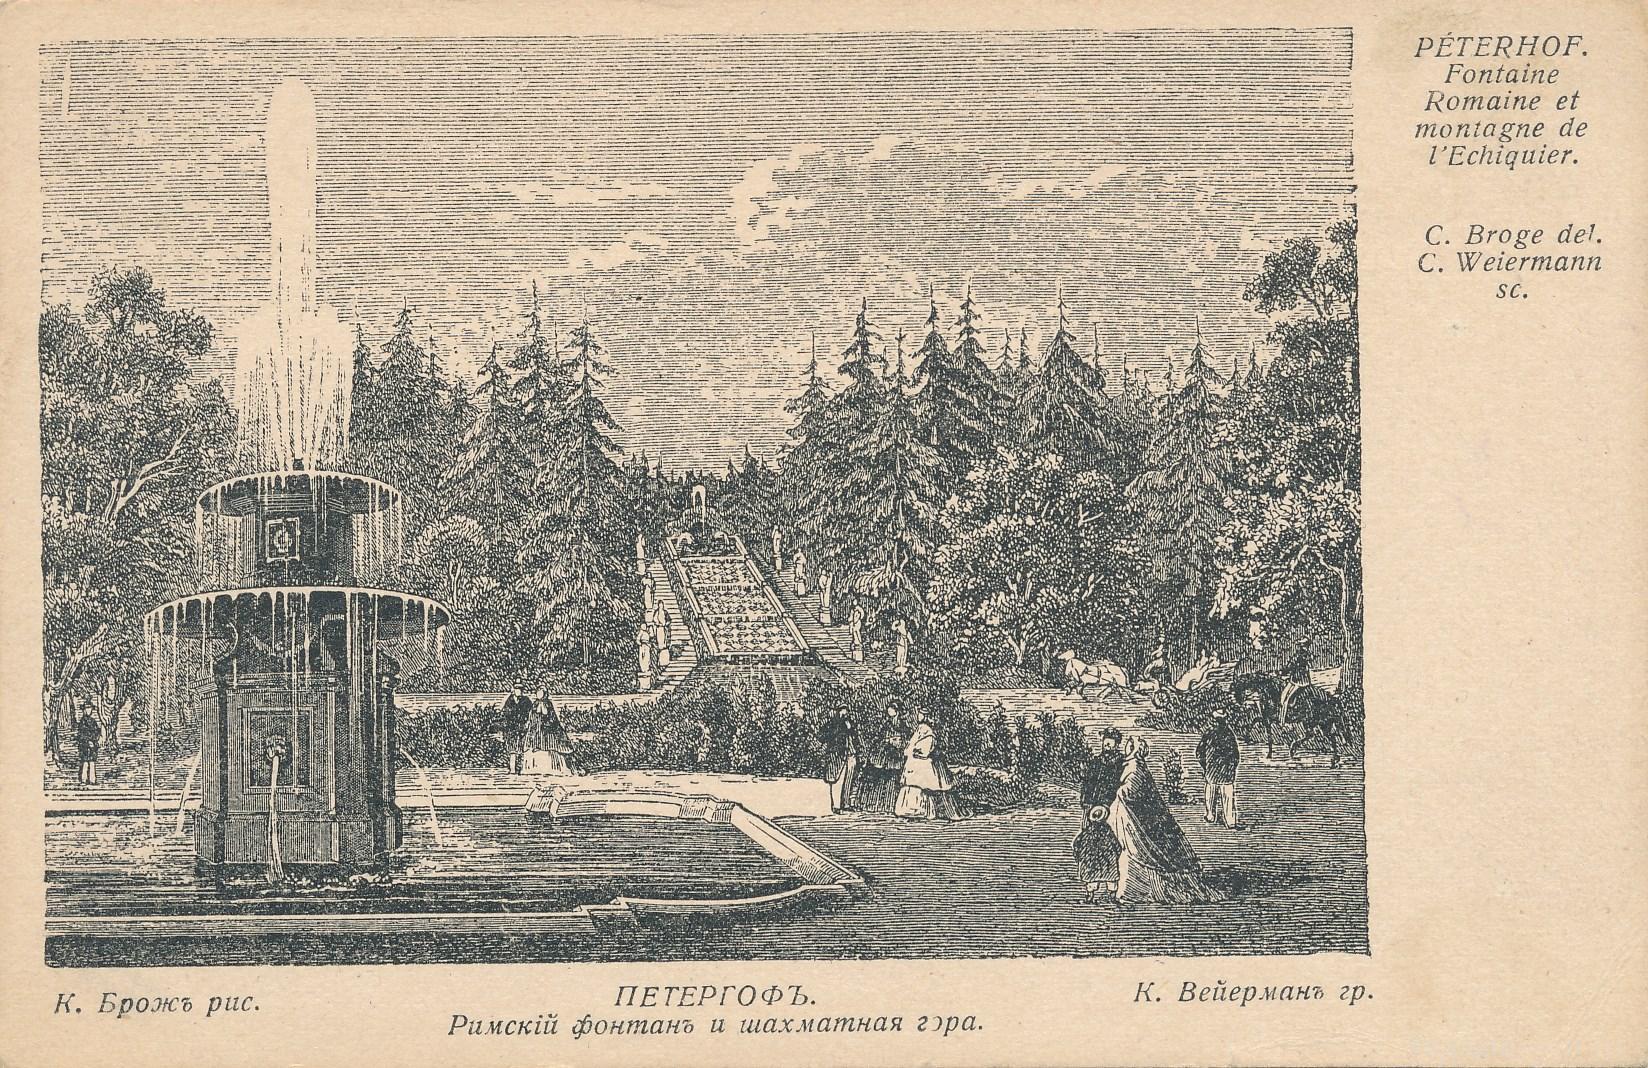 Римский фонтан и Шахматная гора